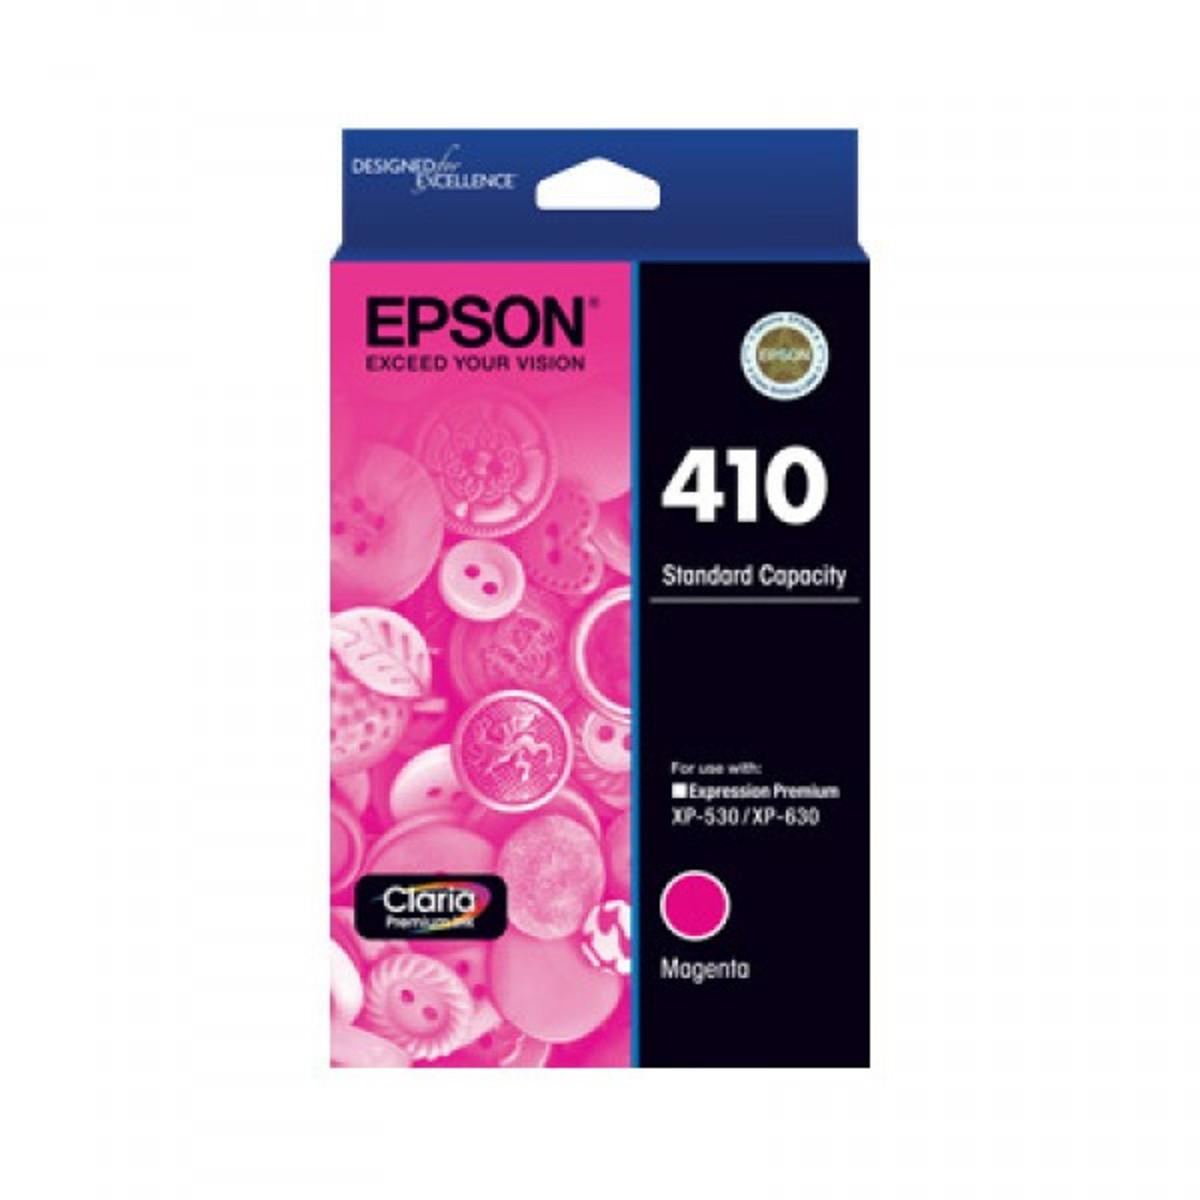 Epson 410 Magenta Inkjet Cartridge